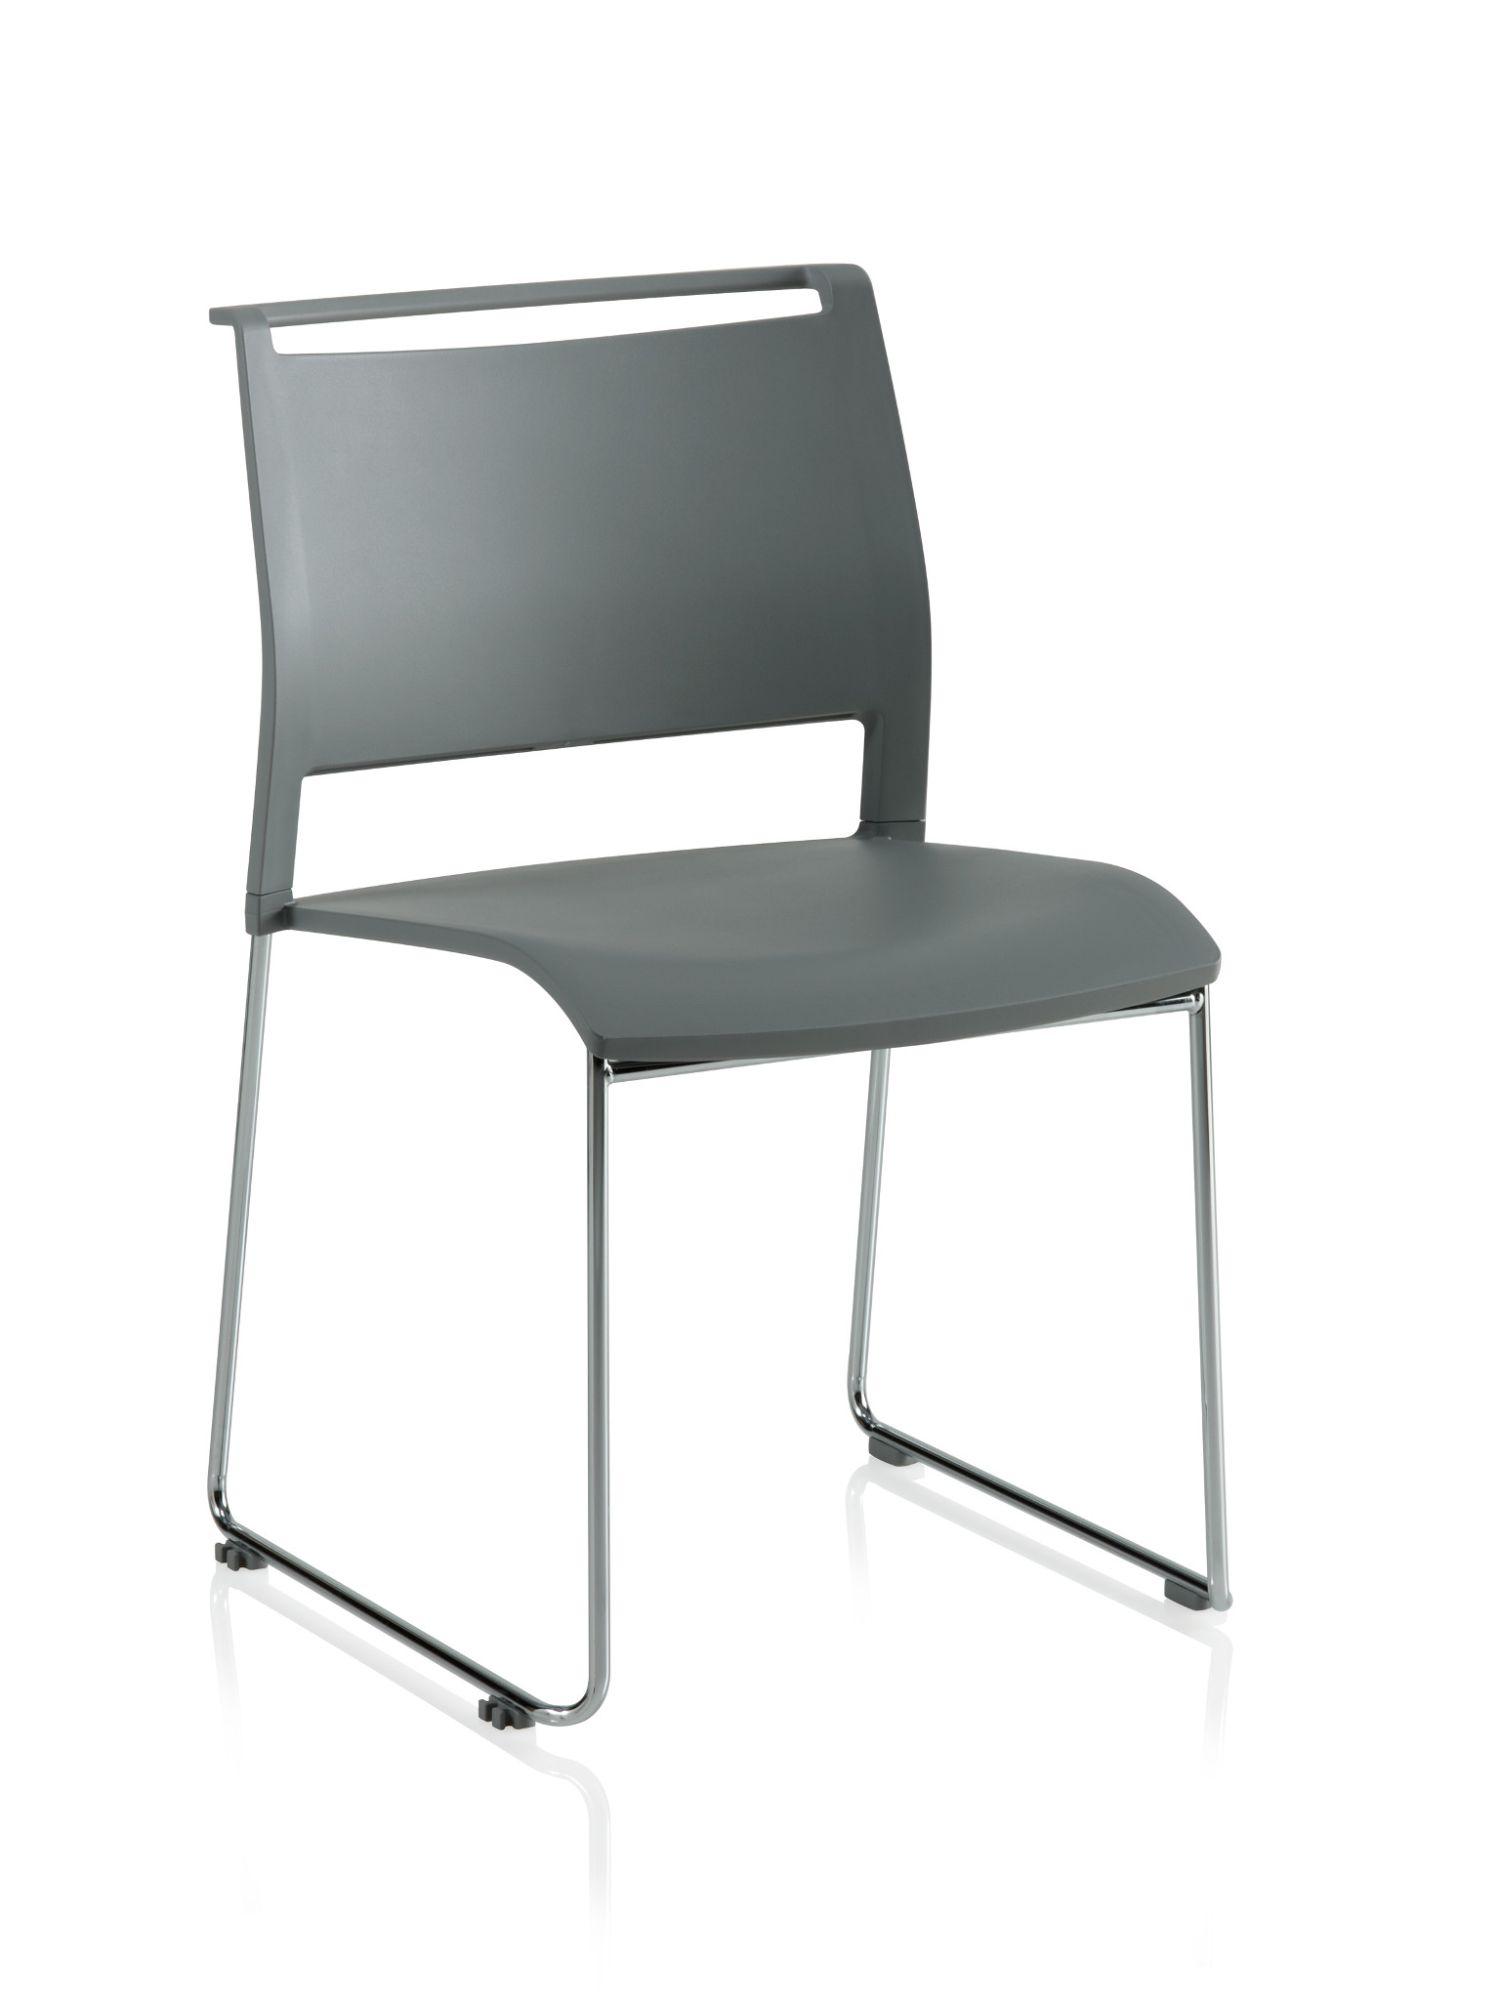 ki opt4 stone grey high density stack chair